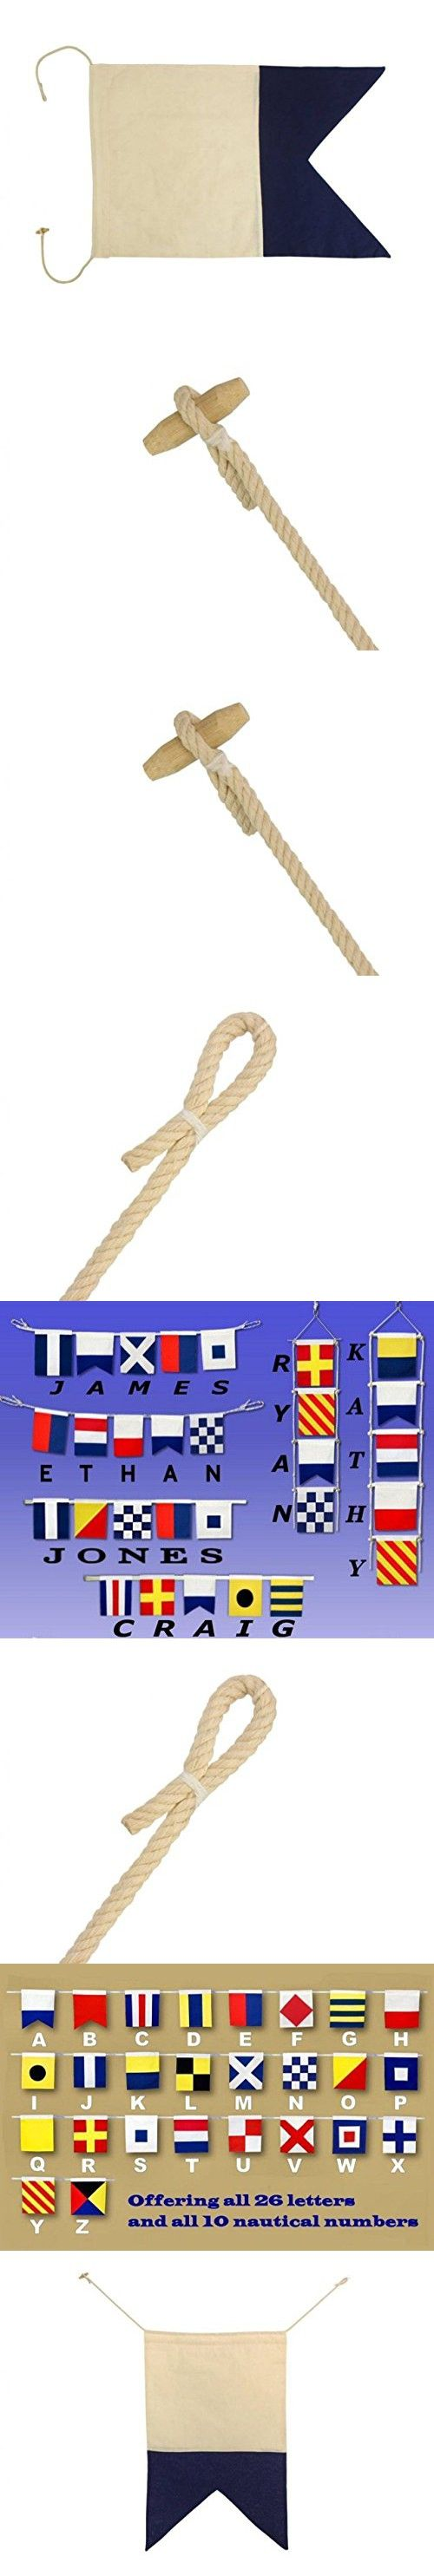 "Hampton Nautical  Letter A Nautical Cloth Alphabet Flag, Decor, Home Decoration, Wall Art Tool, 20"""